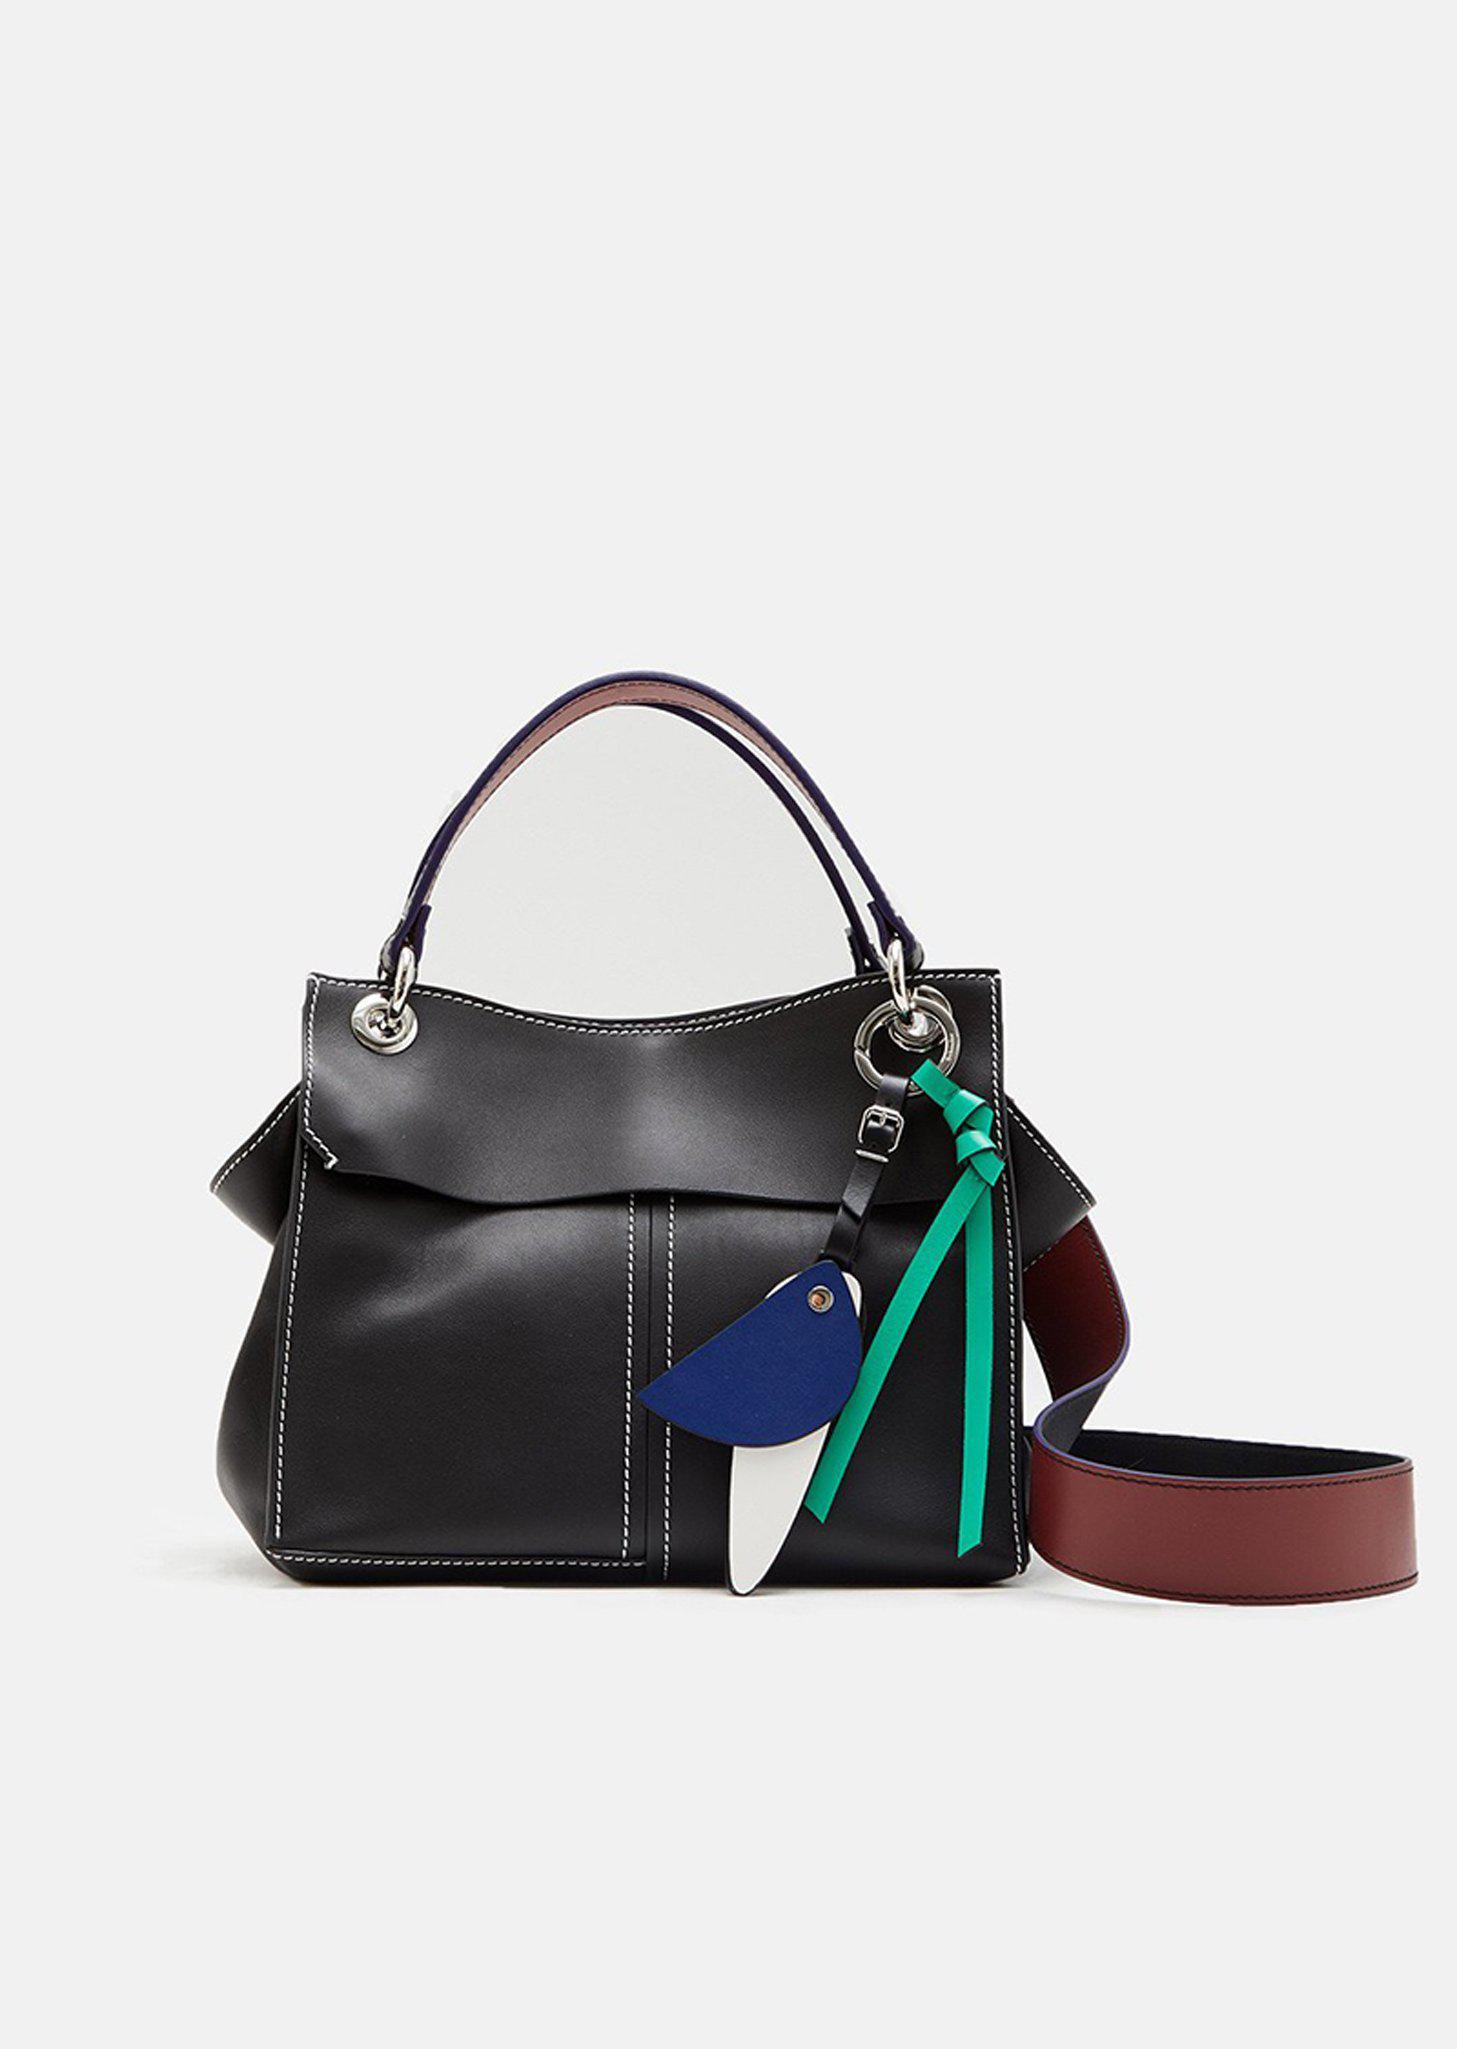 Curl Handbag - Black Proenza Schouler h7yP4GWg